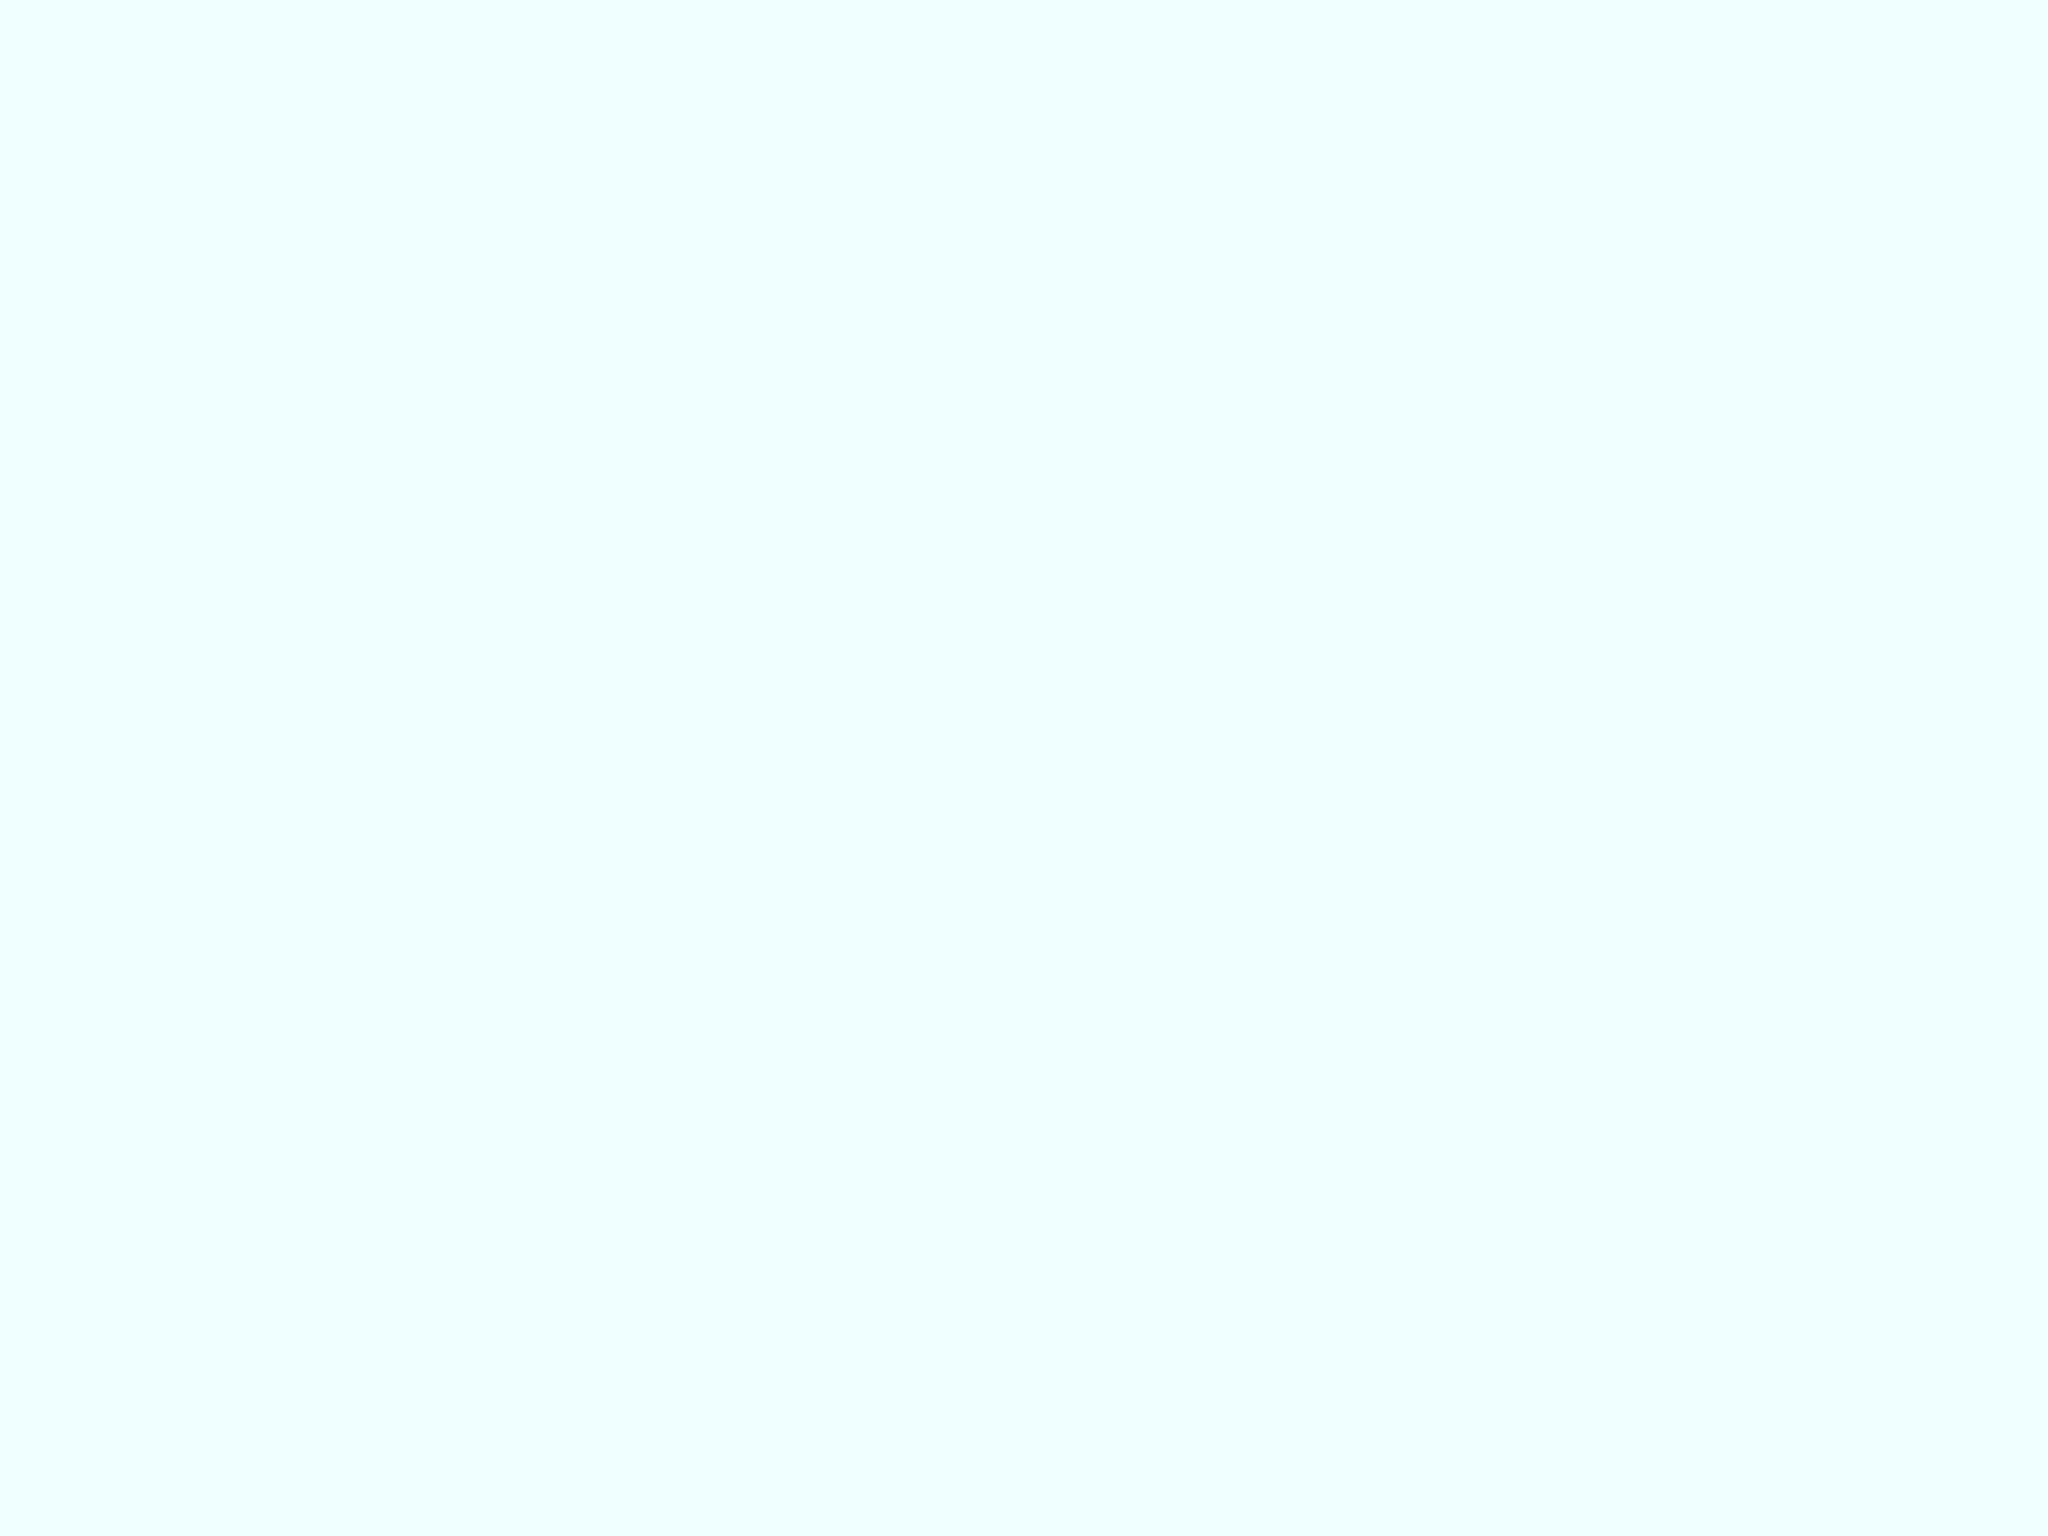 2048x1536 Azure Mist Solid Color Background